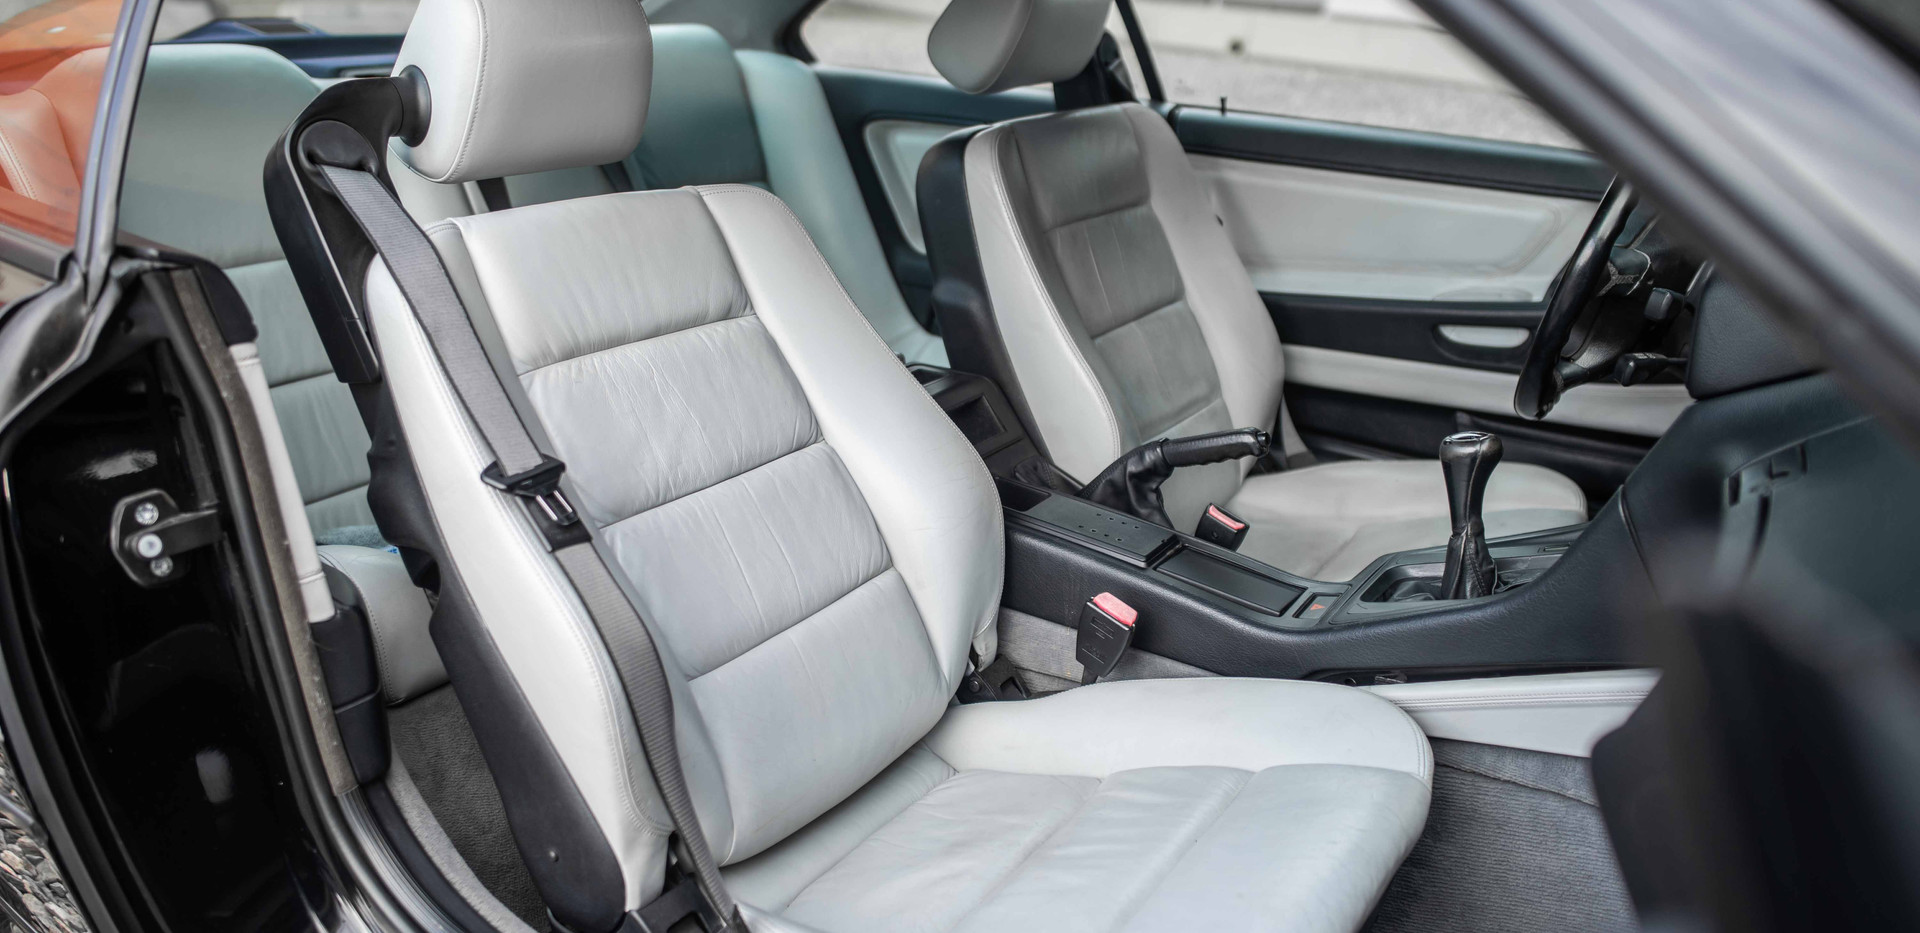 Interior_Front_Seats_Passenger_850.jpg